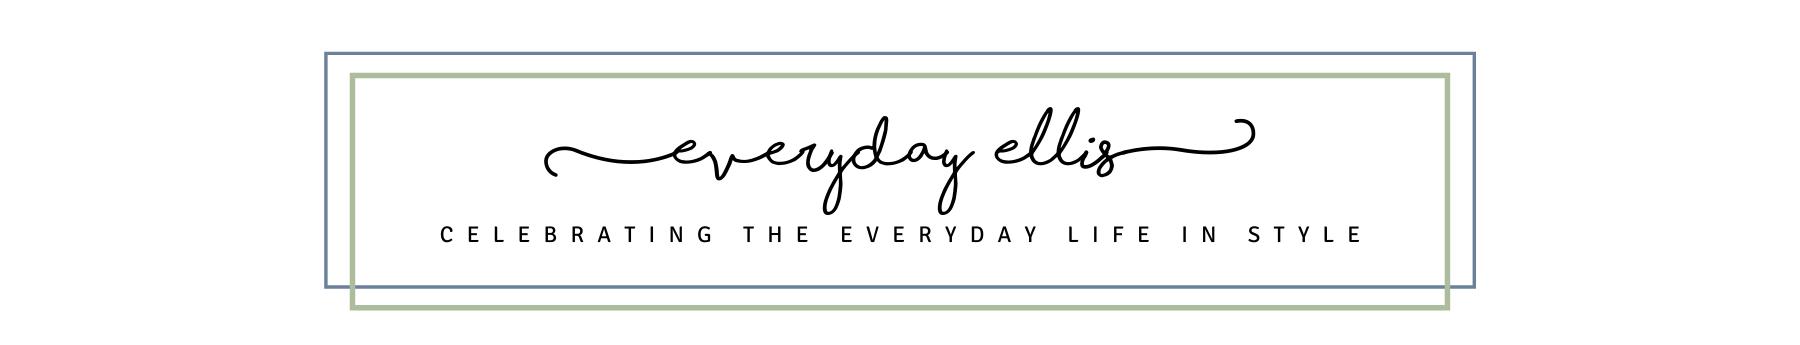 Everyday Ellis